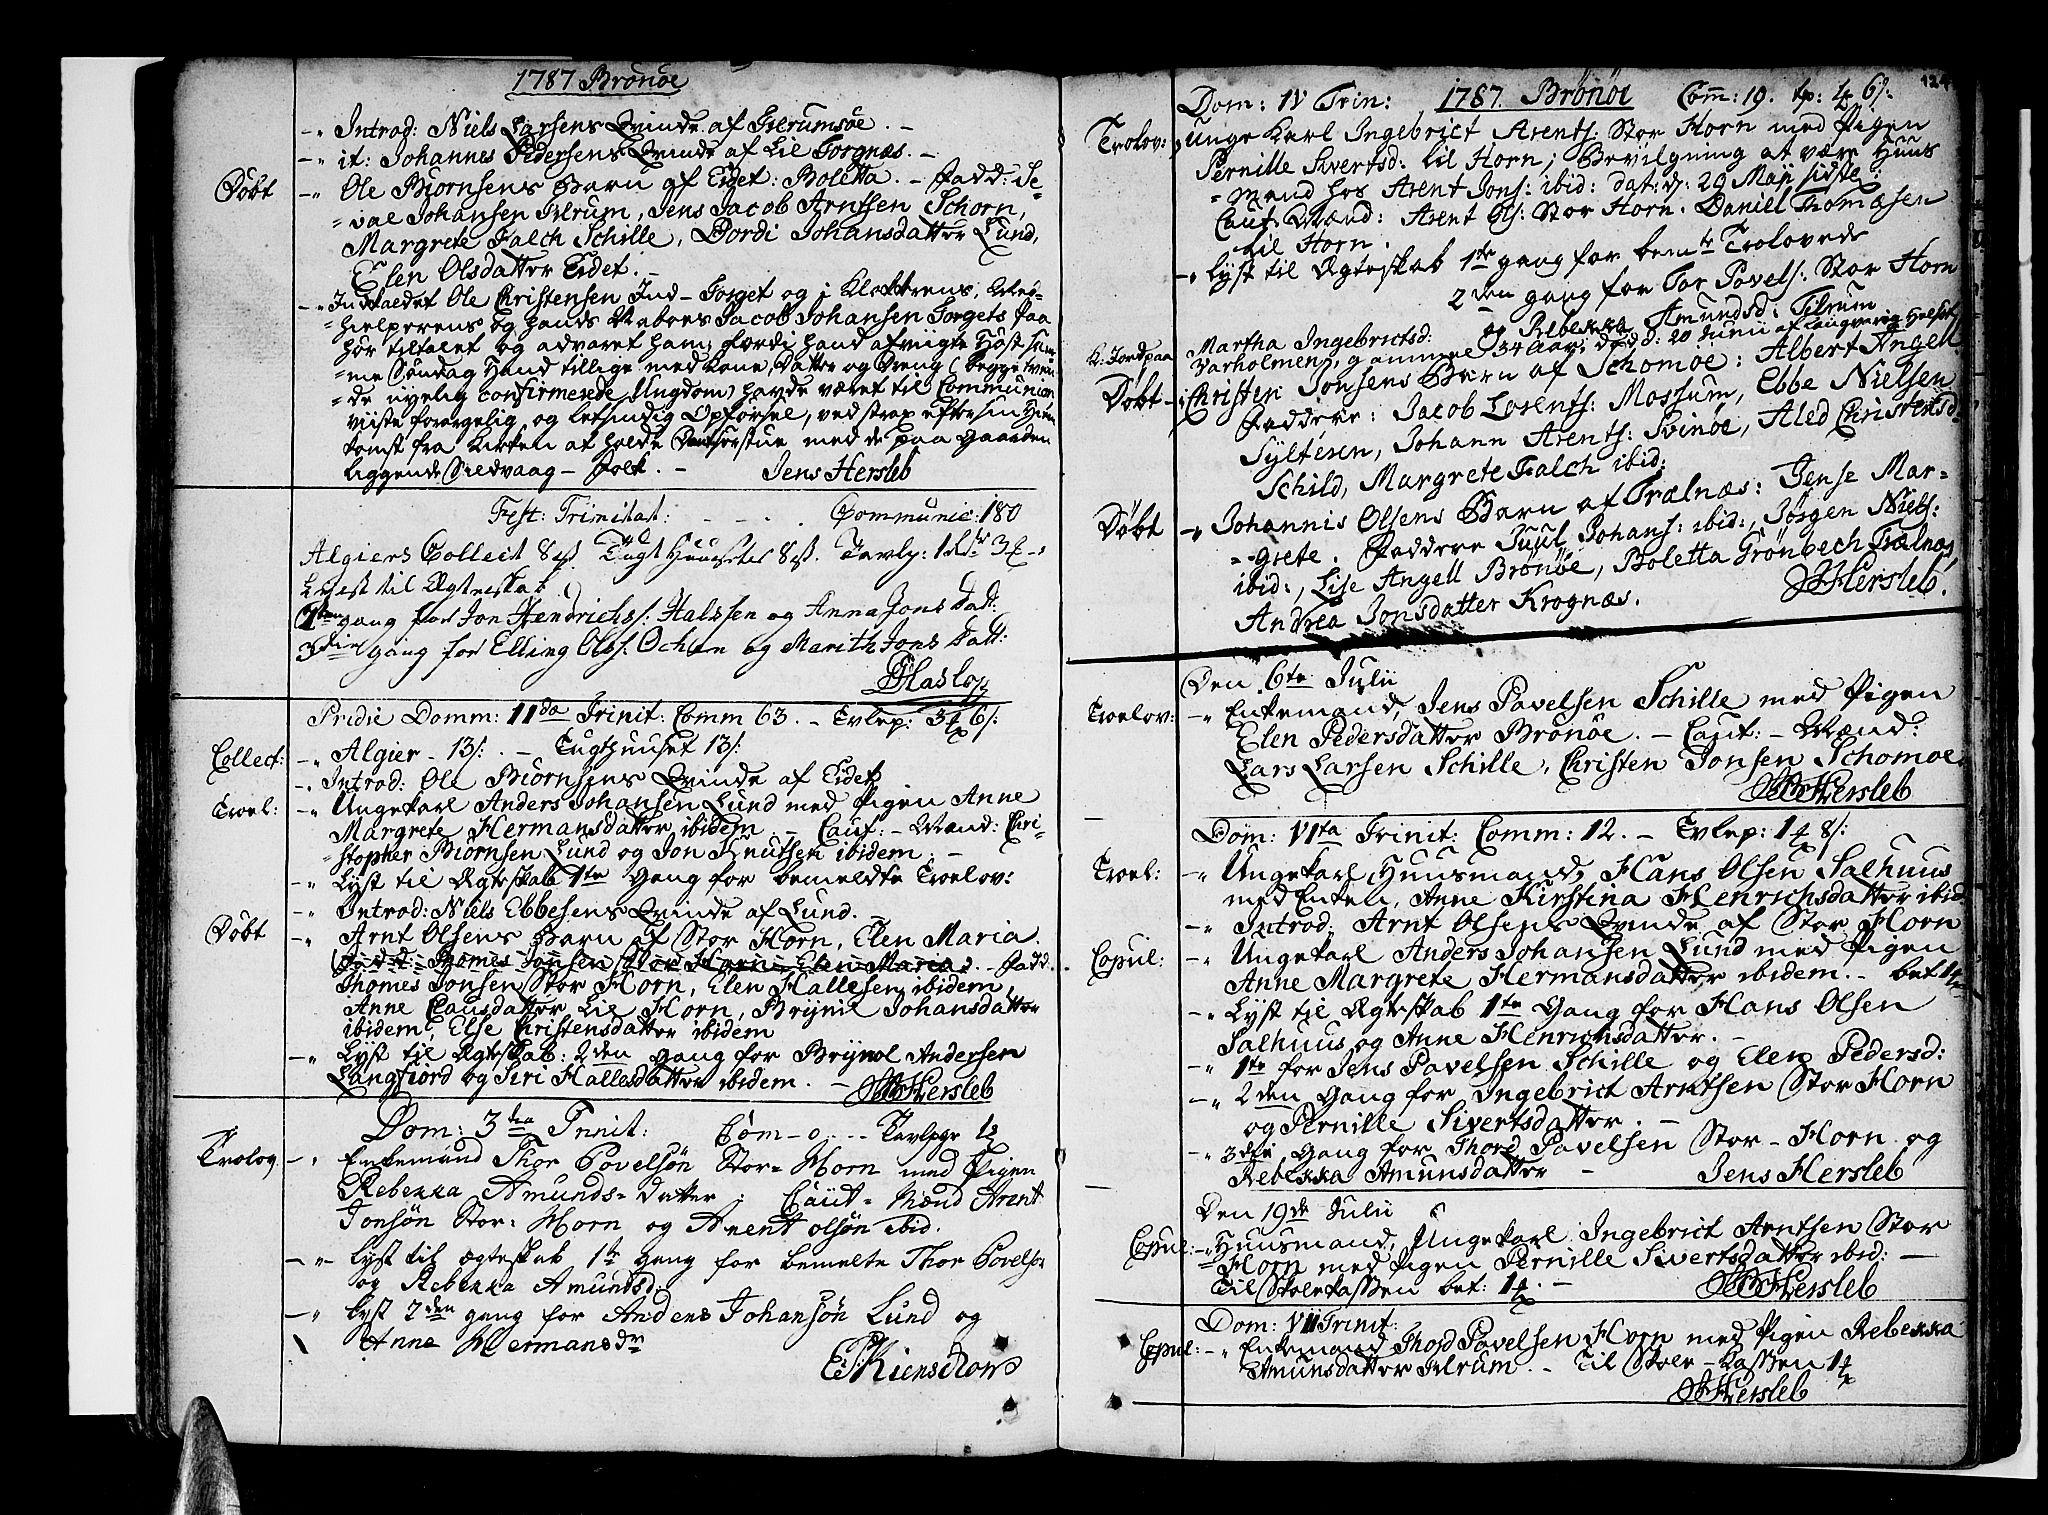 SAT, Ministerialprotokoller, klokkerbøker og fødselsregistre - Nordland, 813/L0195: Ministerialbok nr. 813A05, 1752-1803, s. 124